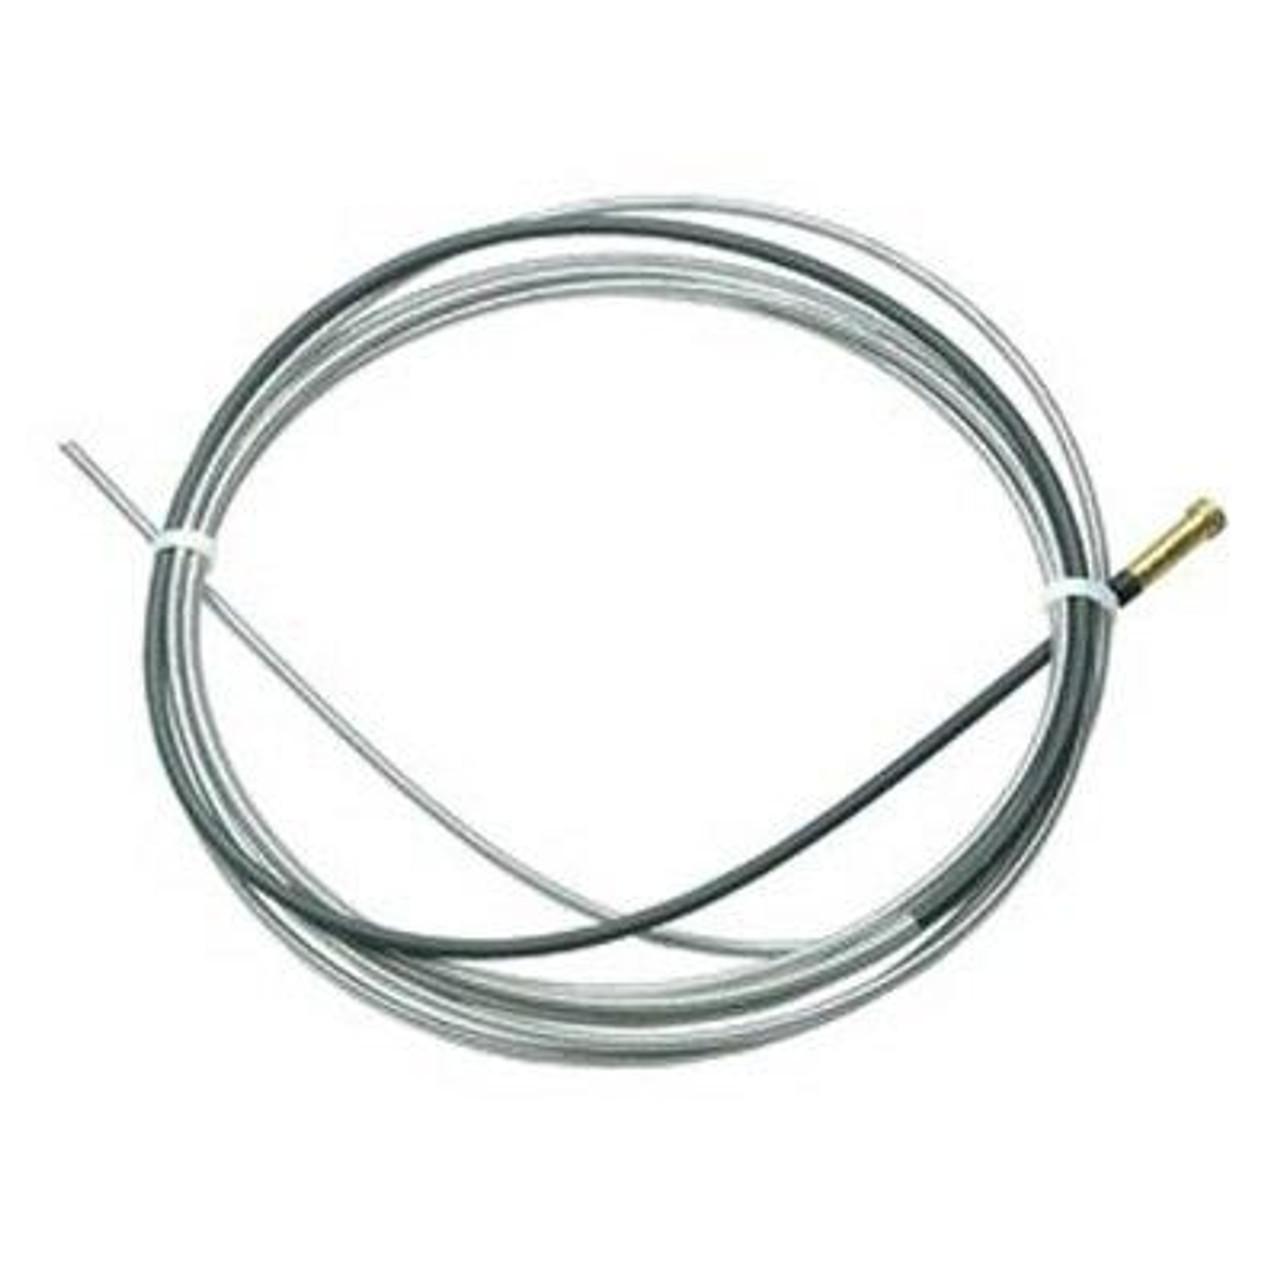 Profax 44-3545-15 MIG Welding Gun Liner for .035-.045 Wire